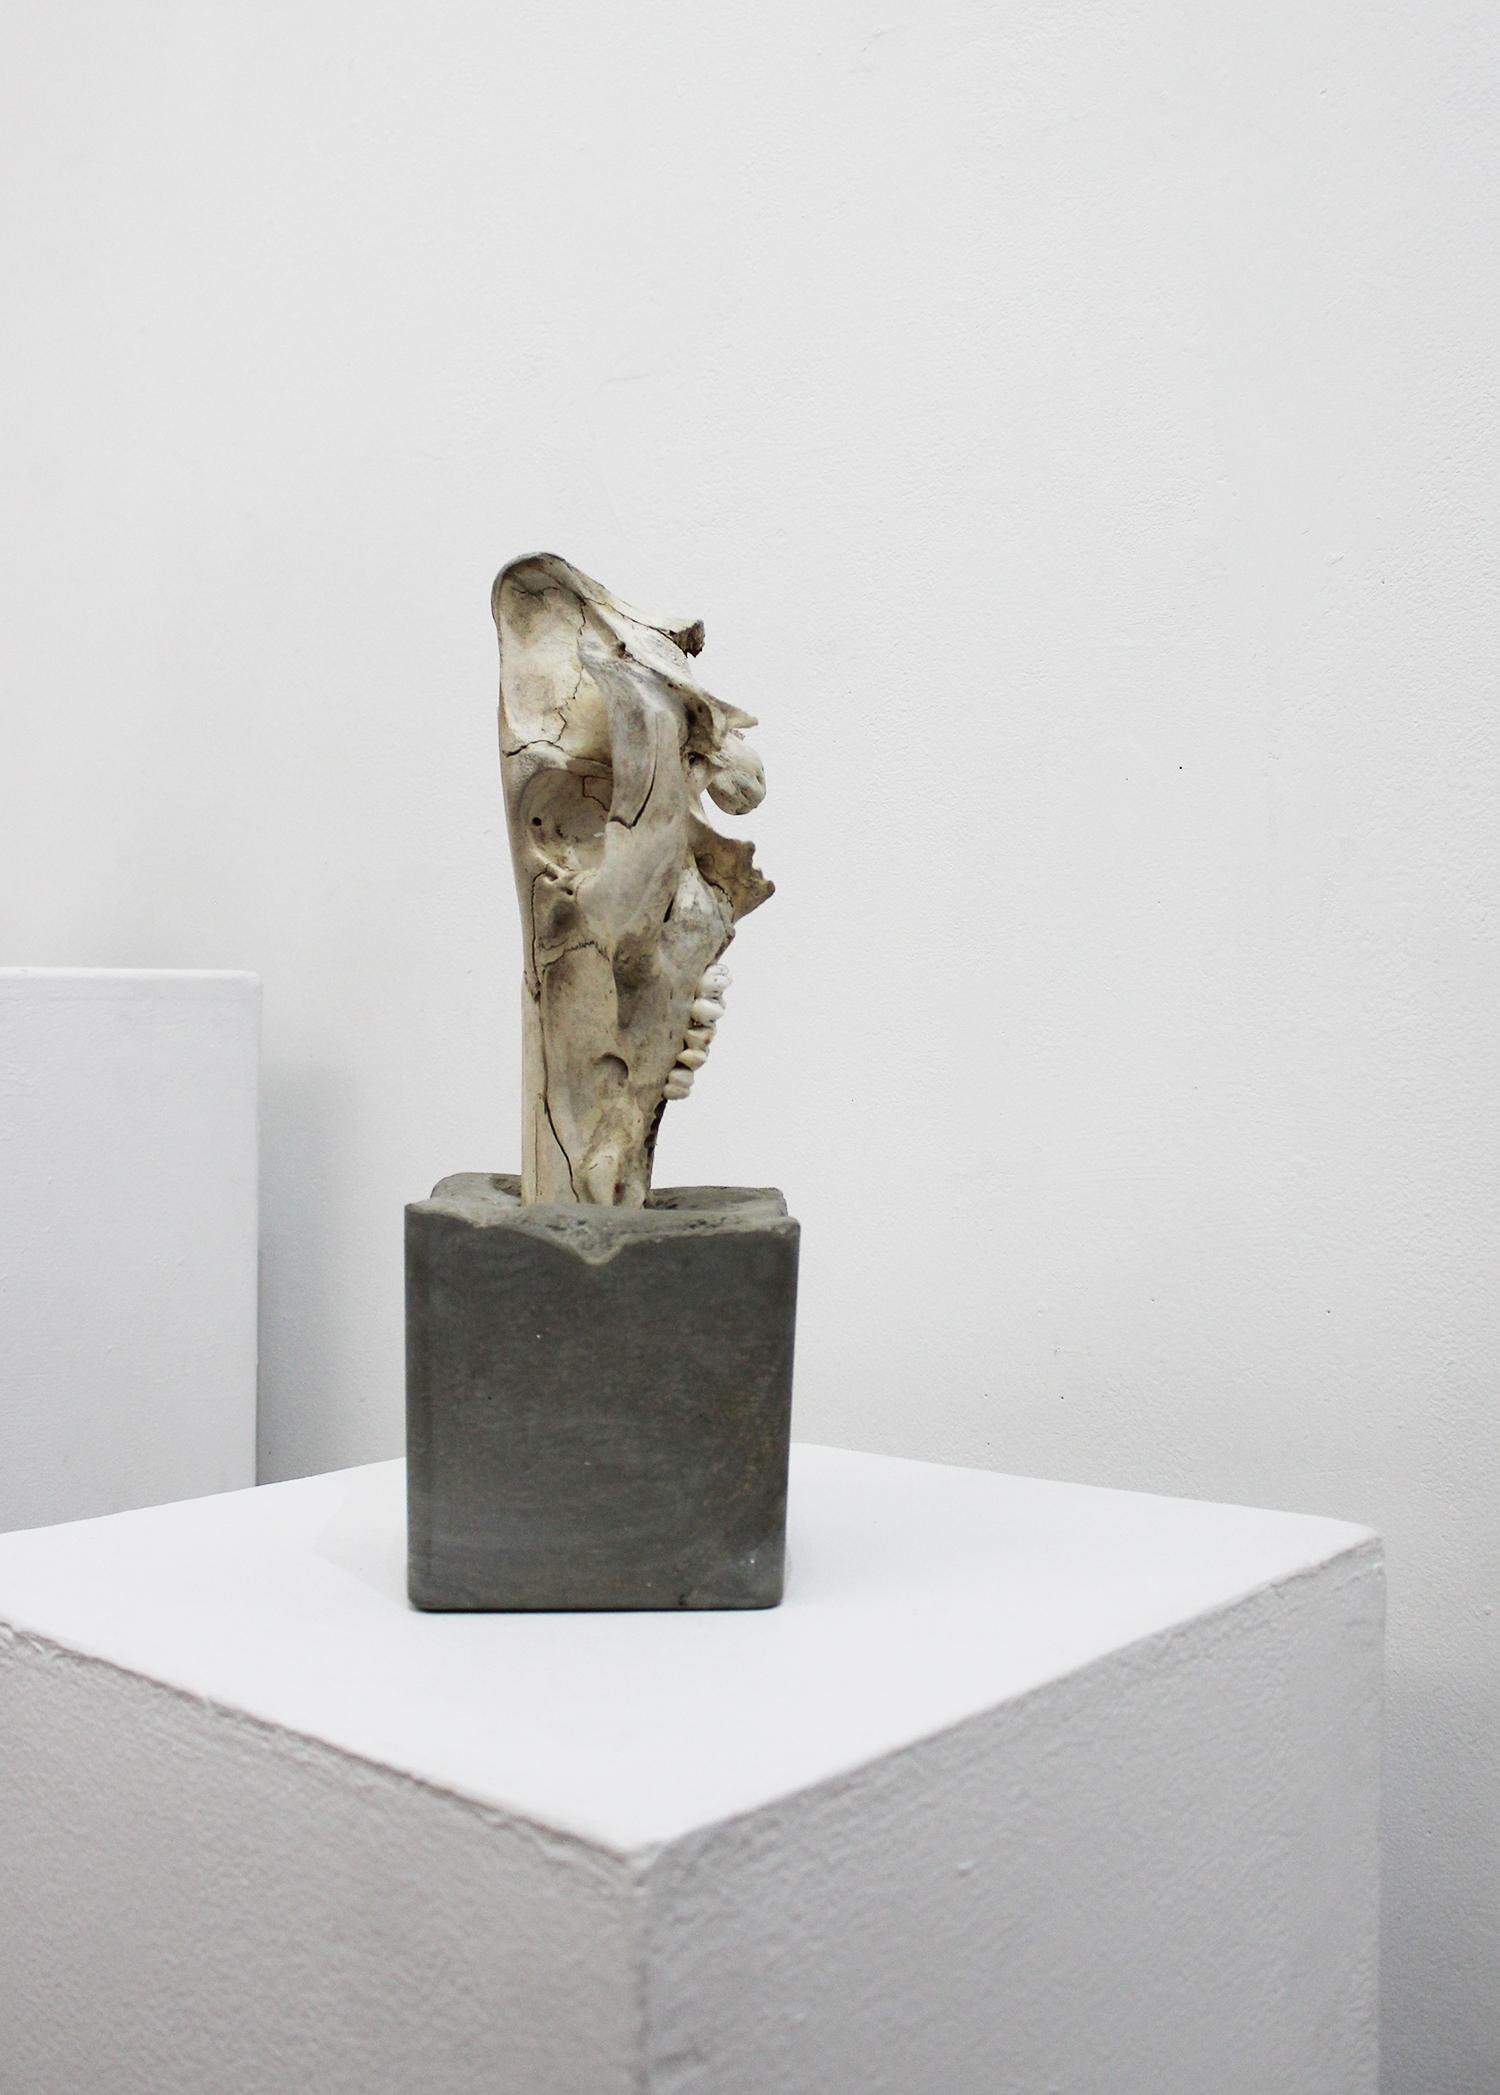 'Submerge, (Polished, a lesson on talking), Christopher Phelan-White, pig skull, polished cement $1500